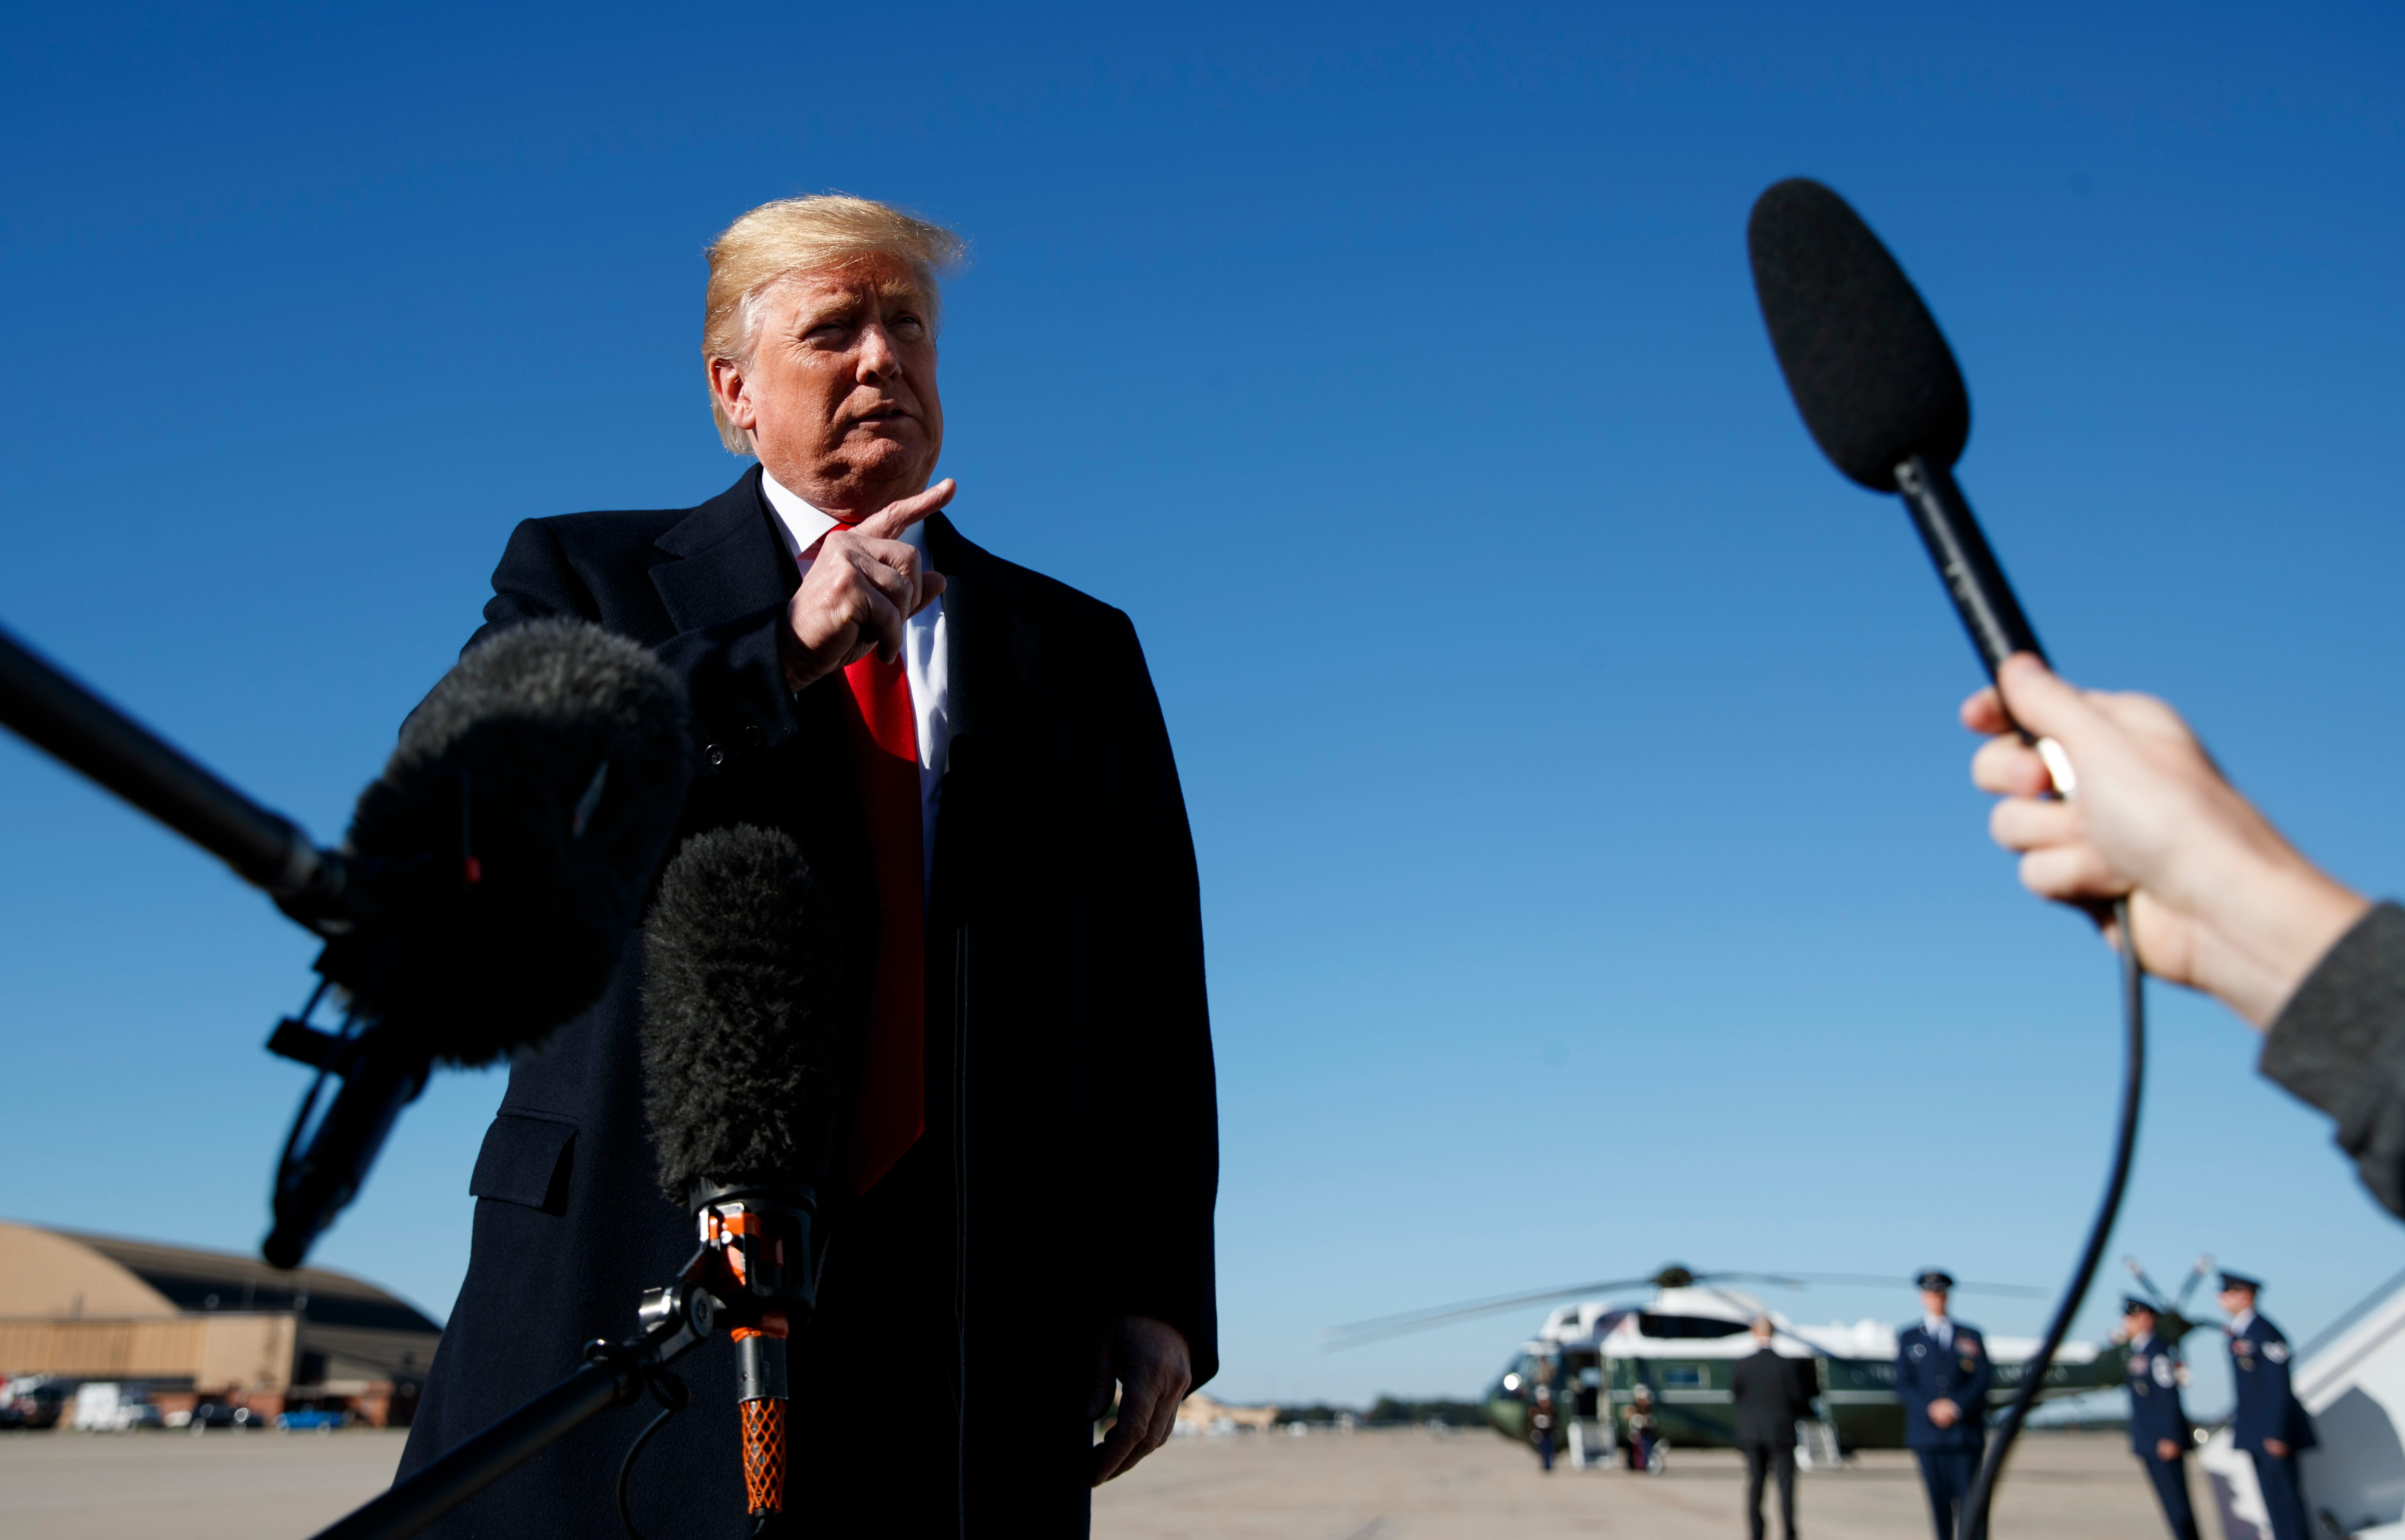 President Donald Trump's campaign visit to Arizona to rally Republicans | Arizona Central